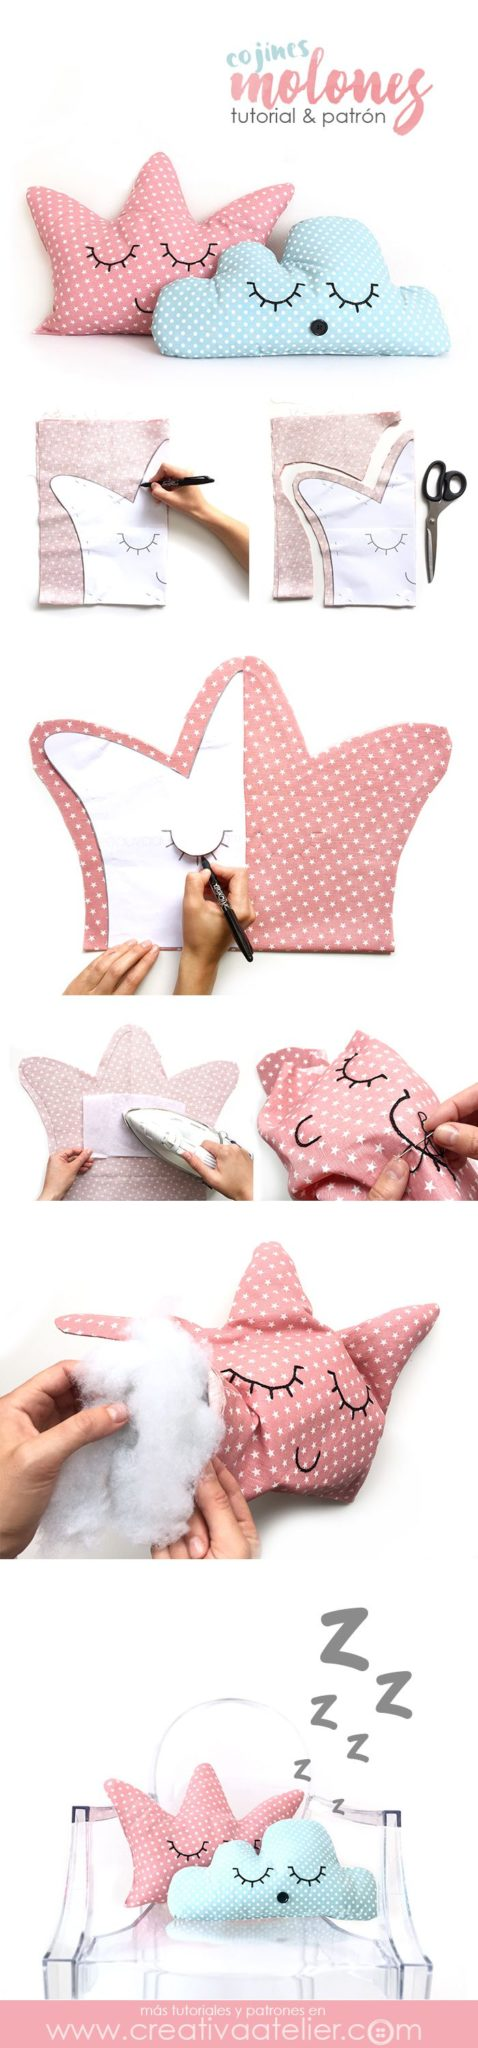 ▷ ✅18 ideas sencillas de manualidades para bebes en tela 【TOP ...